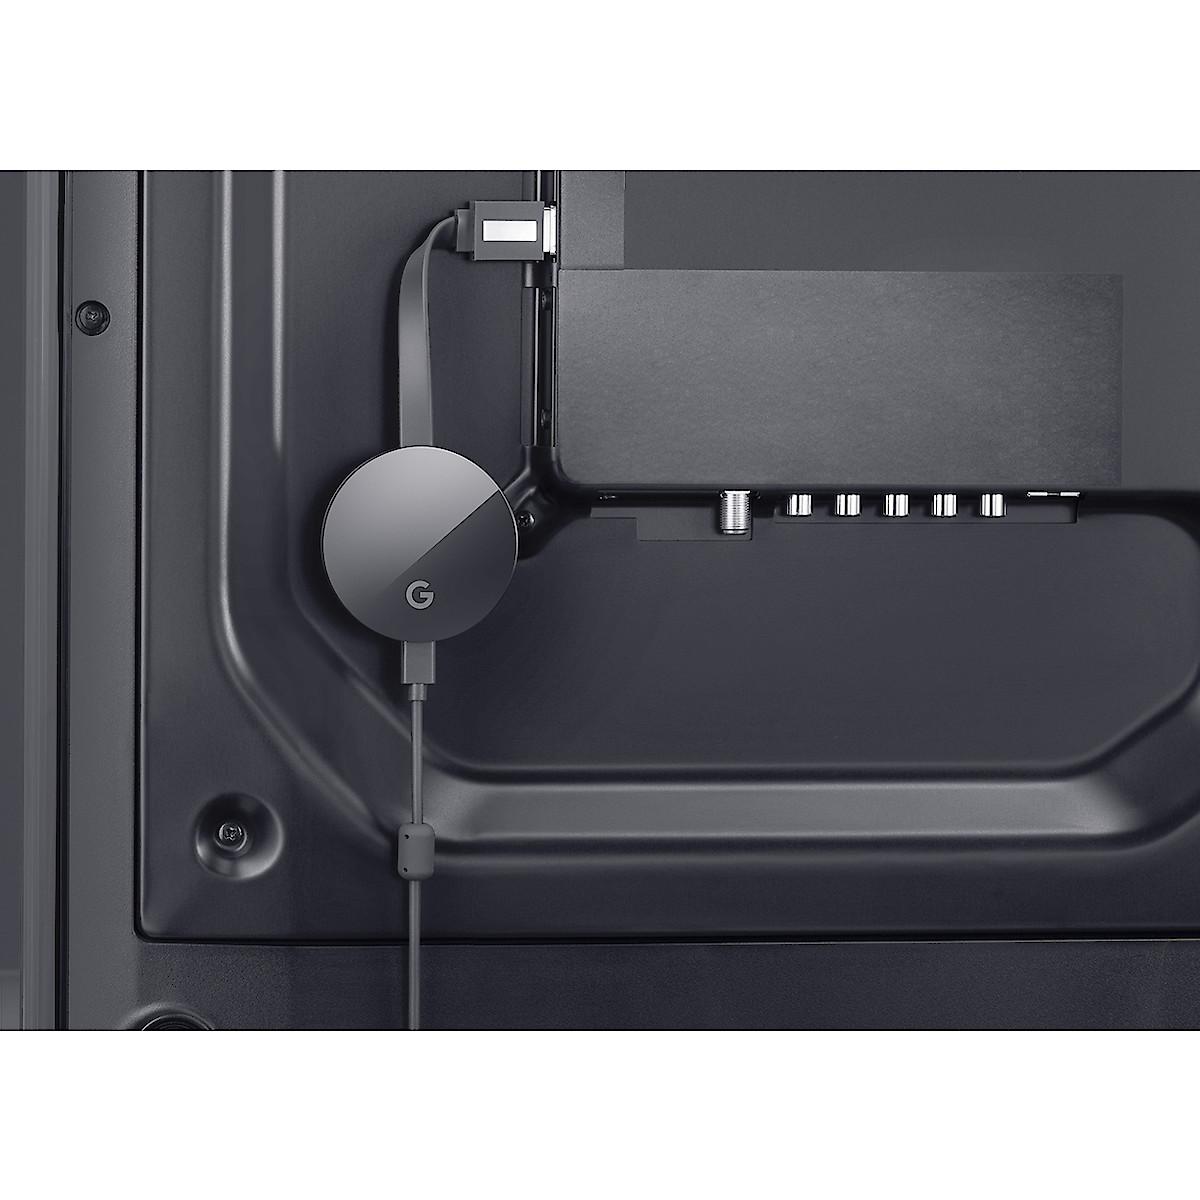 Mediaspelare Google Chromecast Ultra